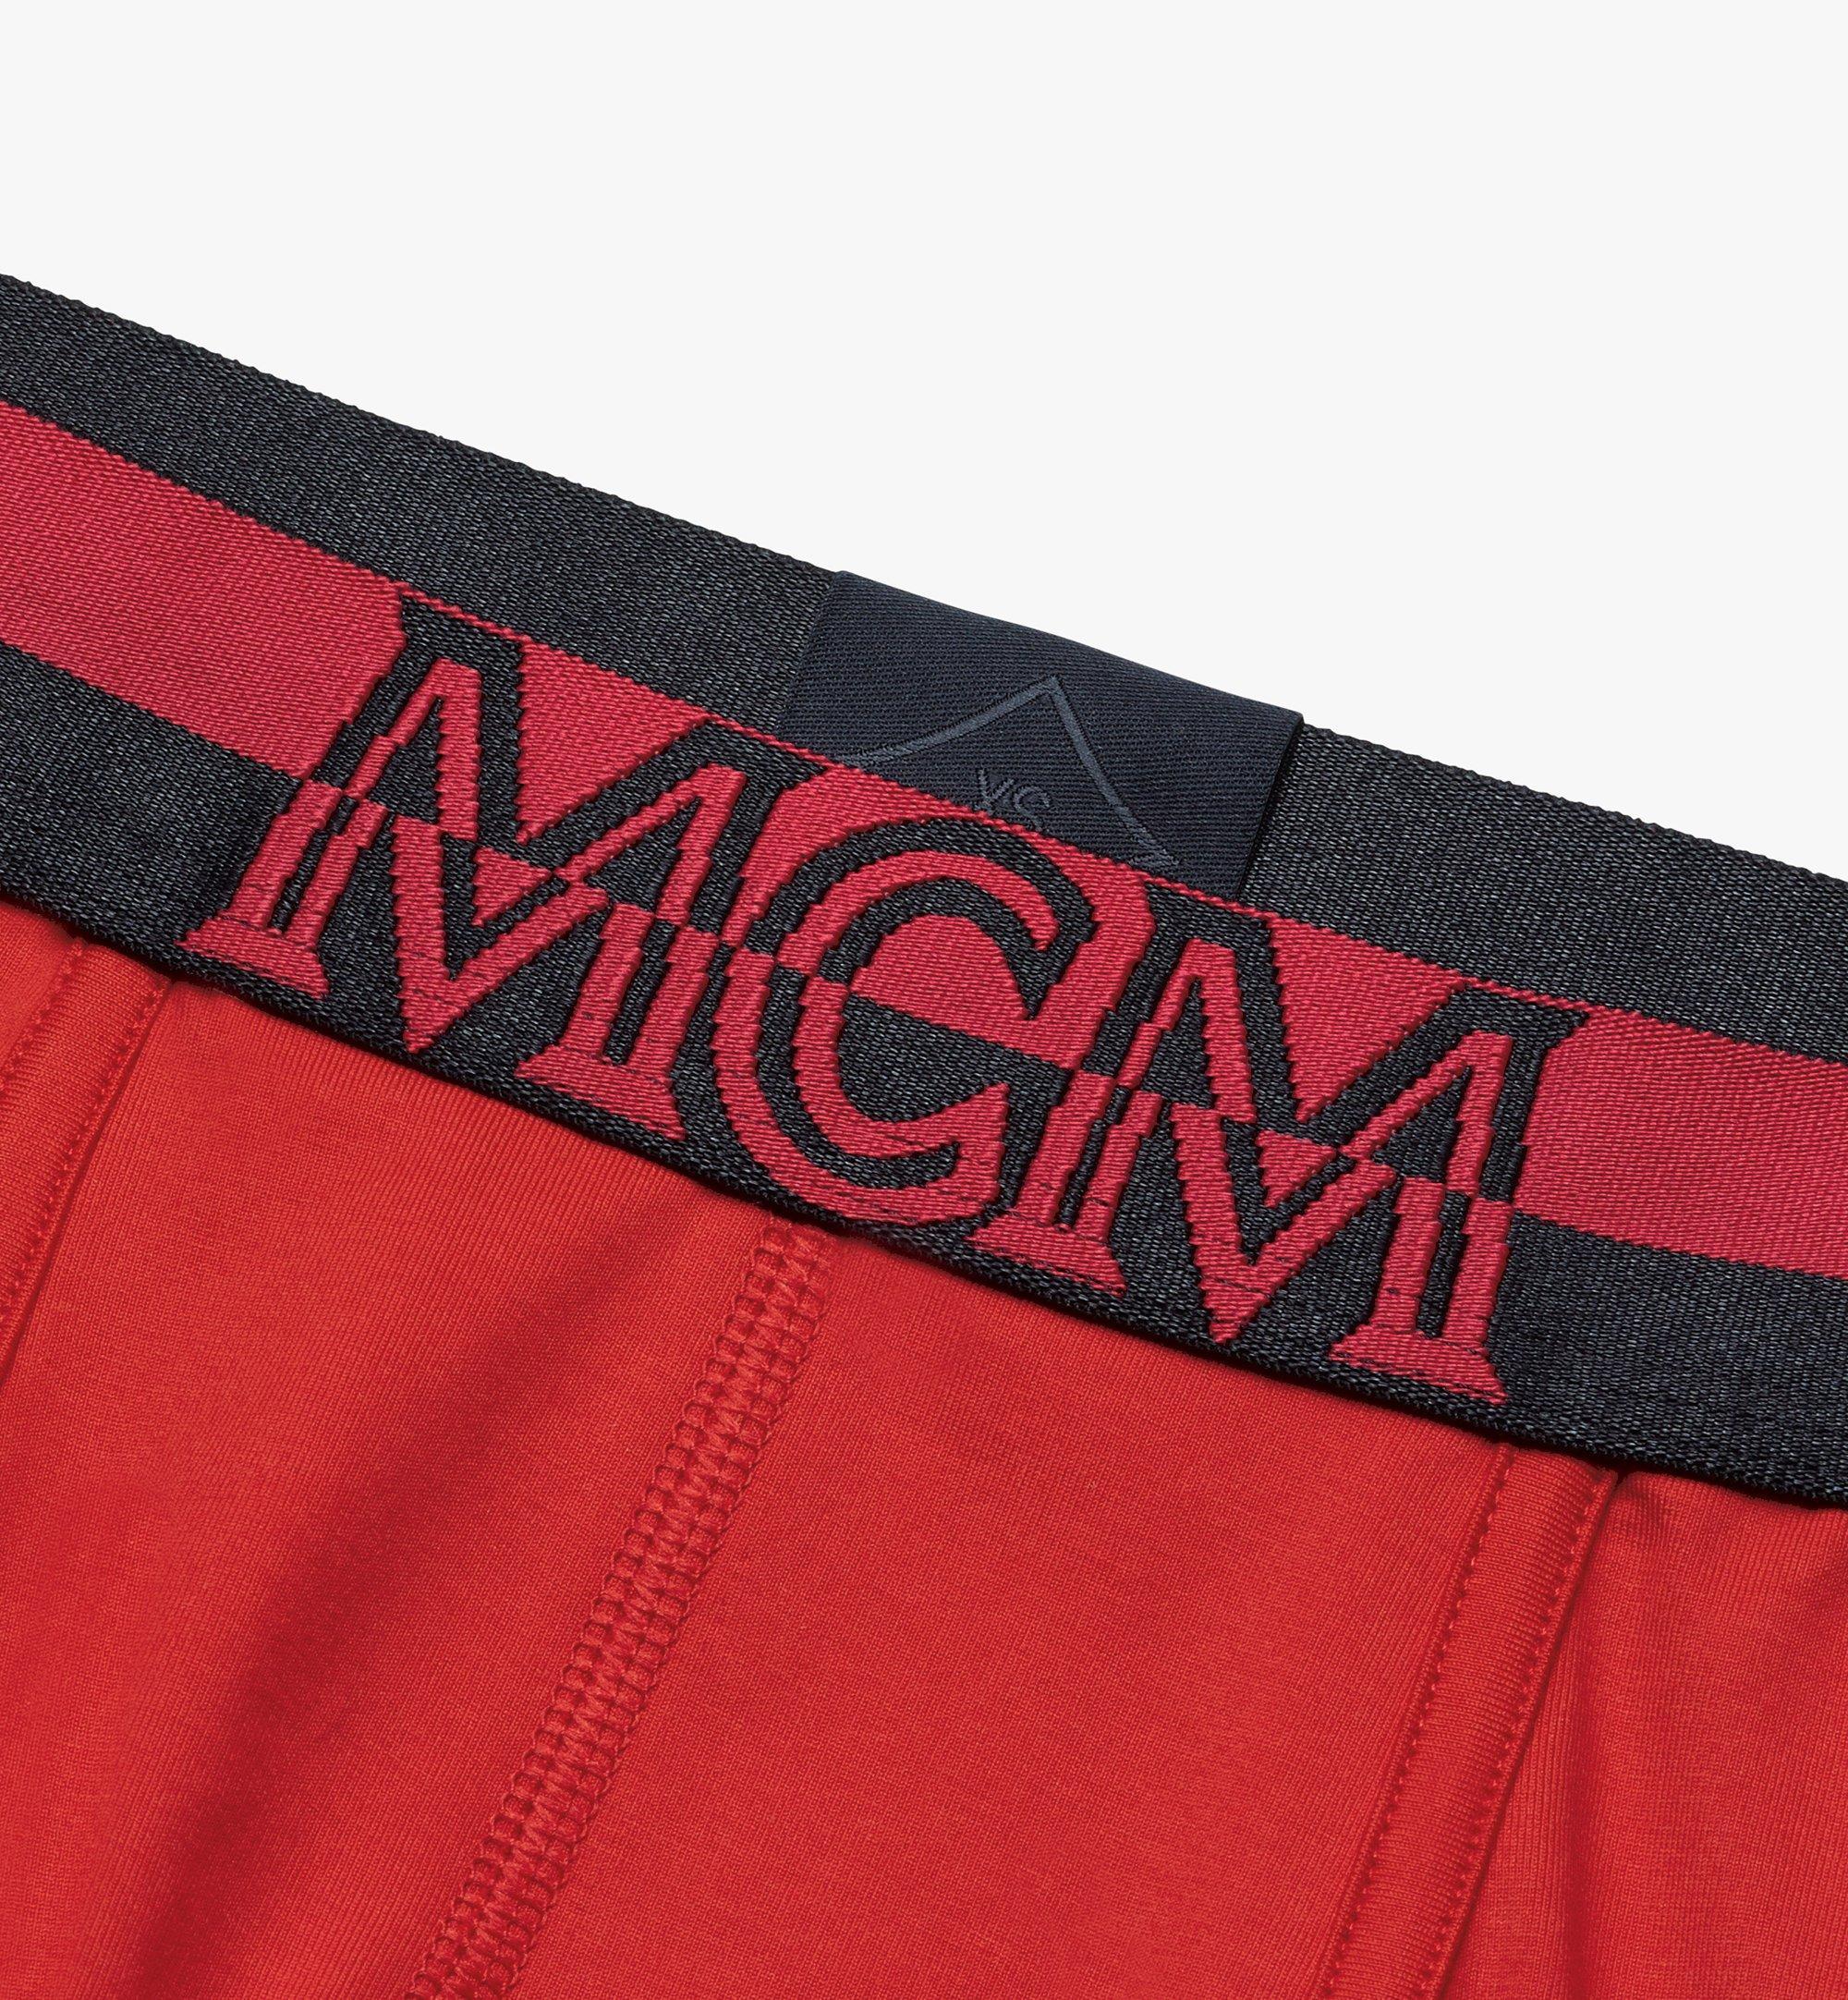 MCM 男士 1976 短款緊身四角褲 Red MHYASBM02RE00M 更多視圖 2